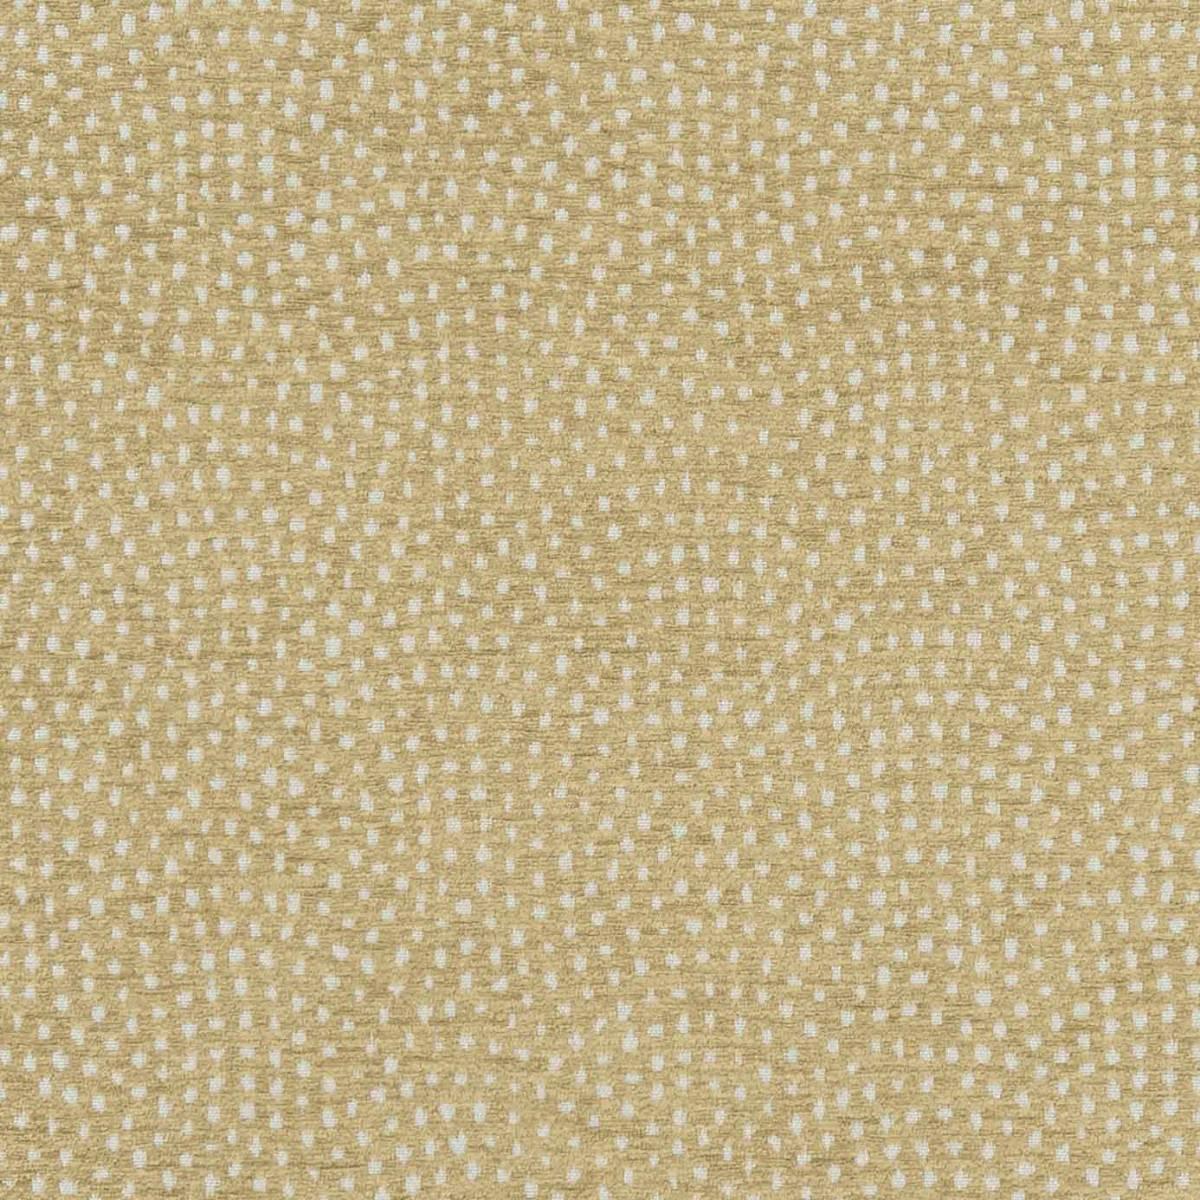 Nebula fabric antique f1132 01 clarke clarke for Nebula material